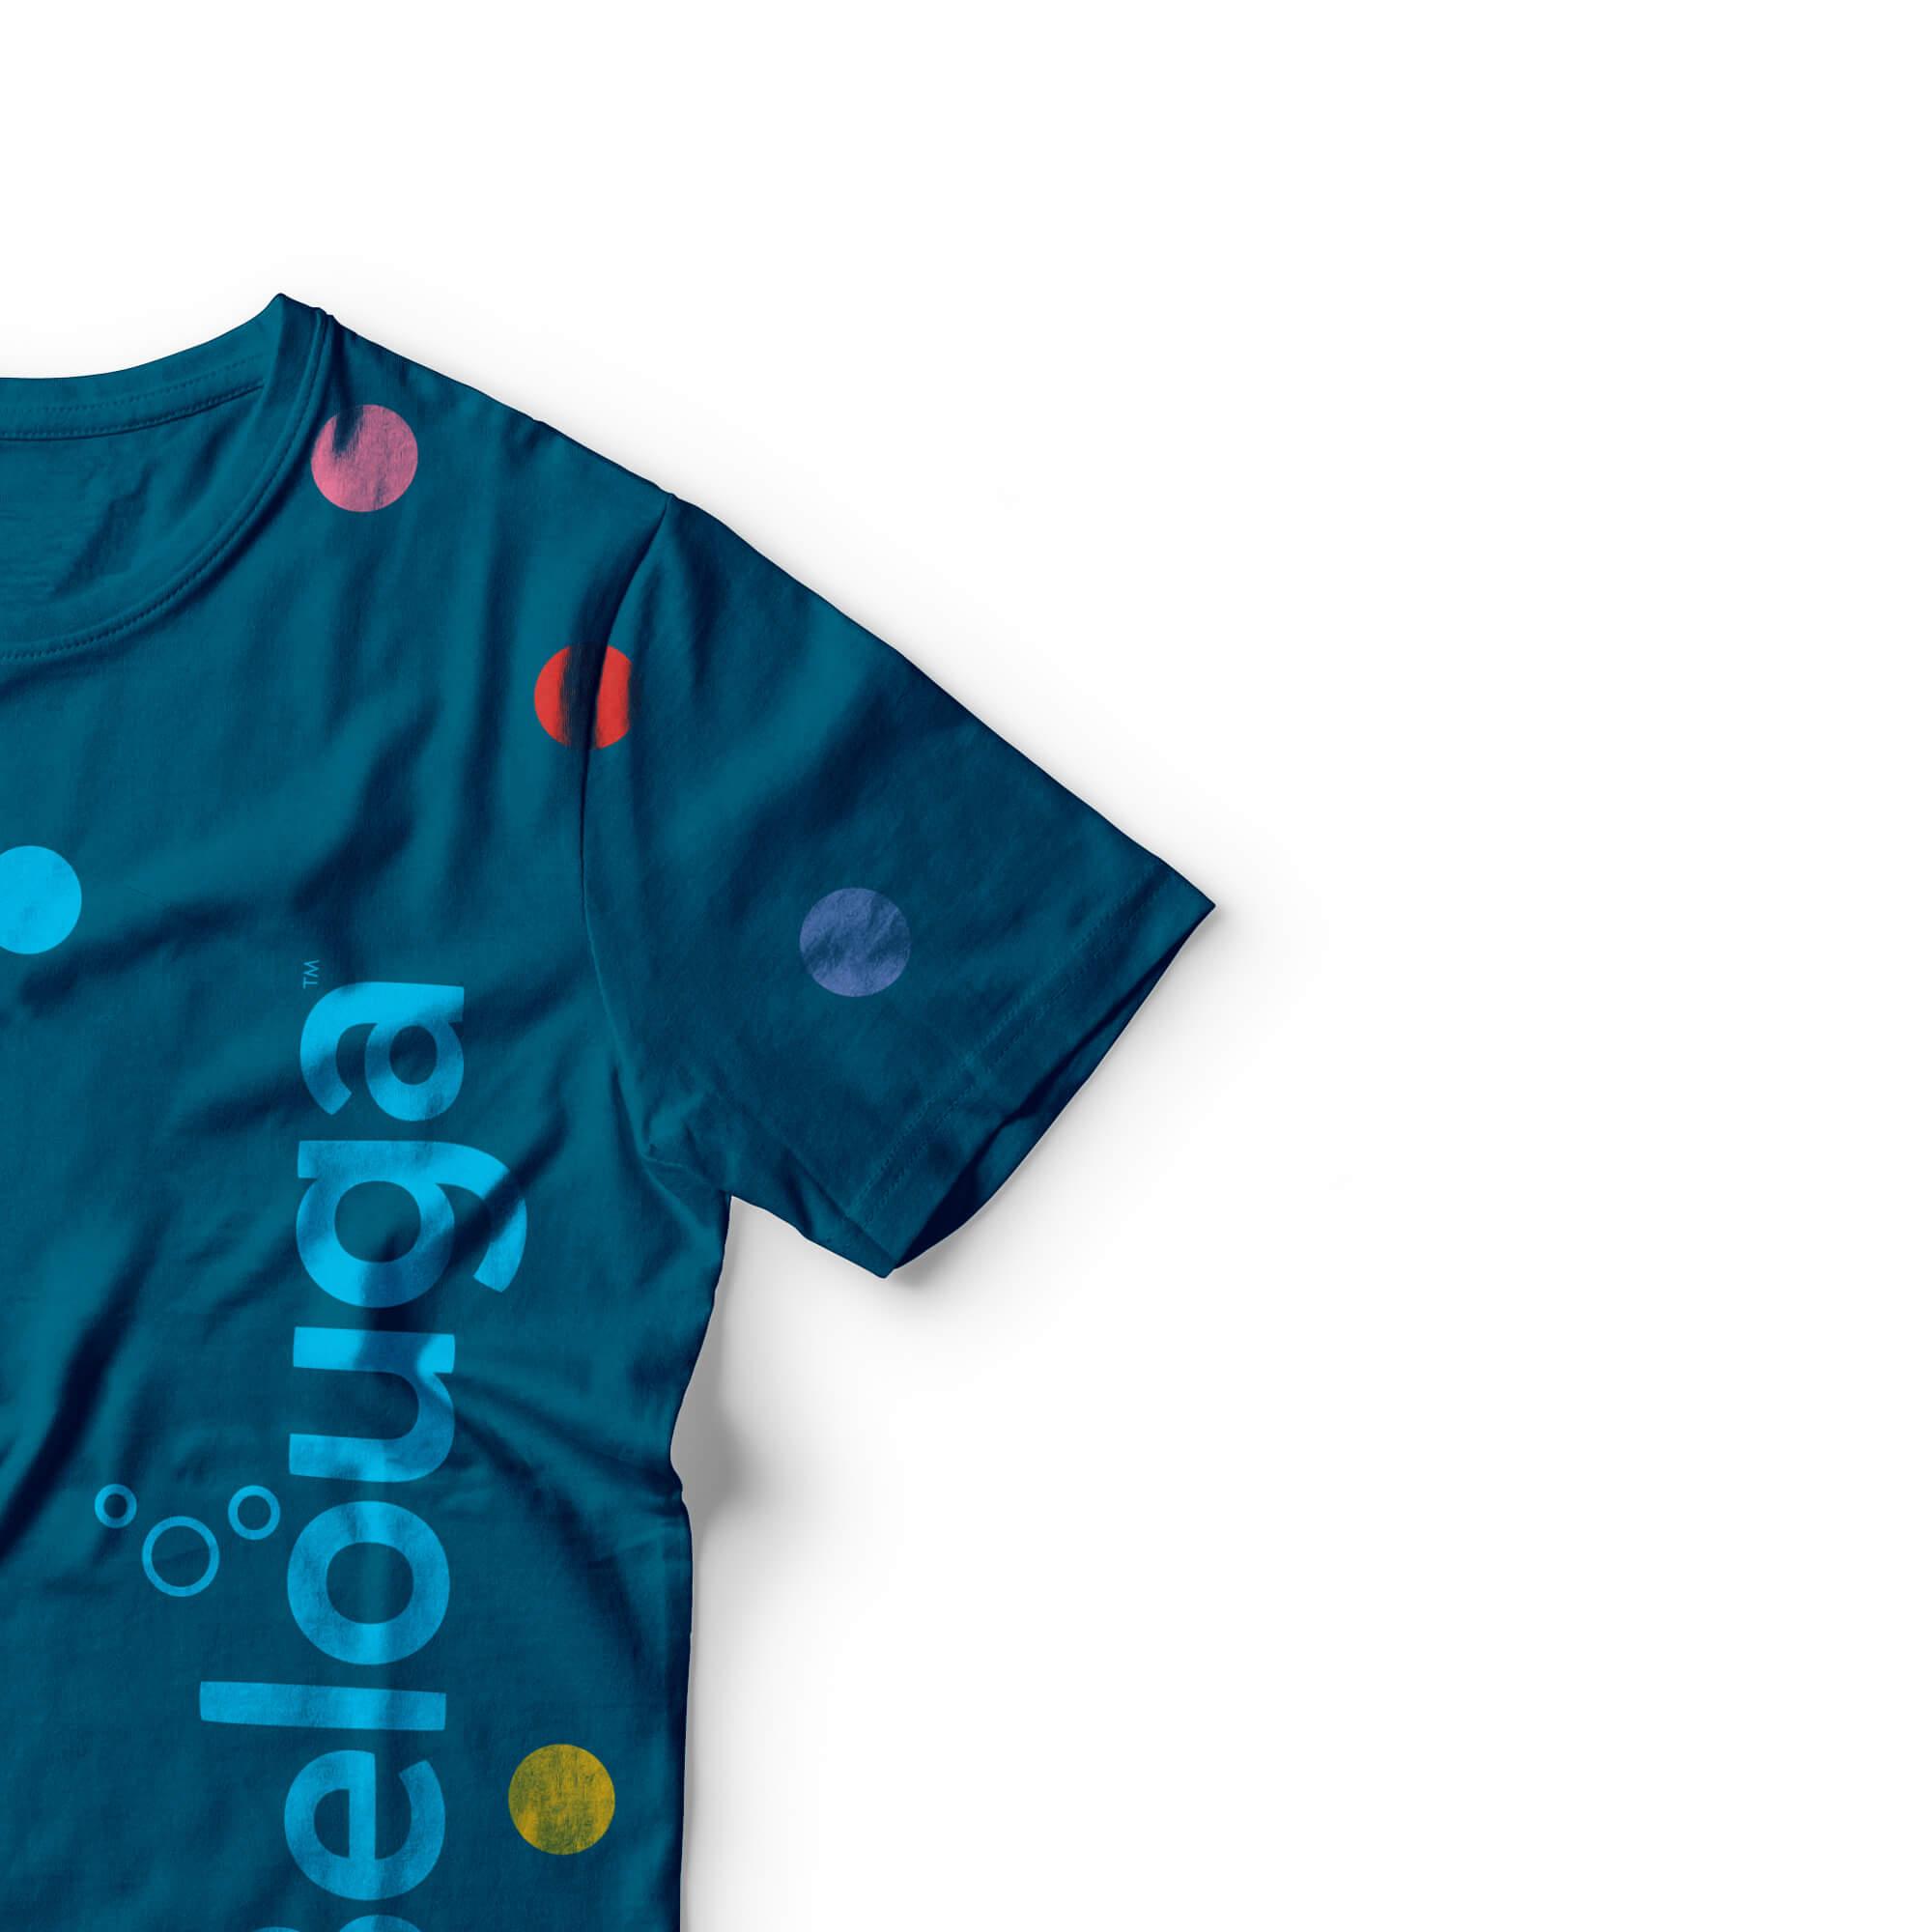 Belouga t-shirt